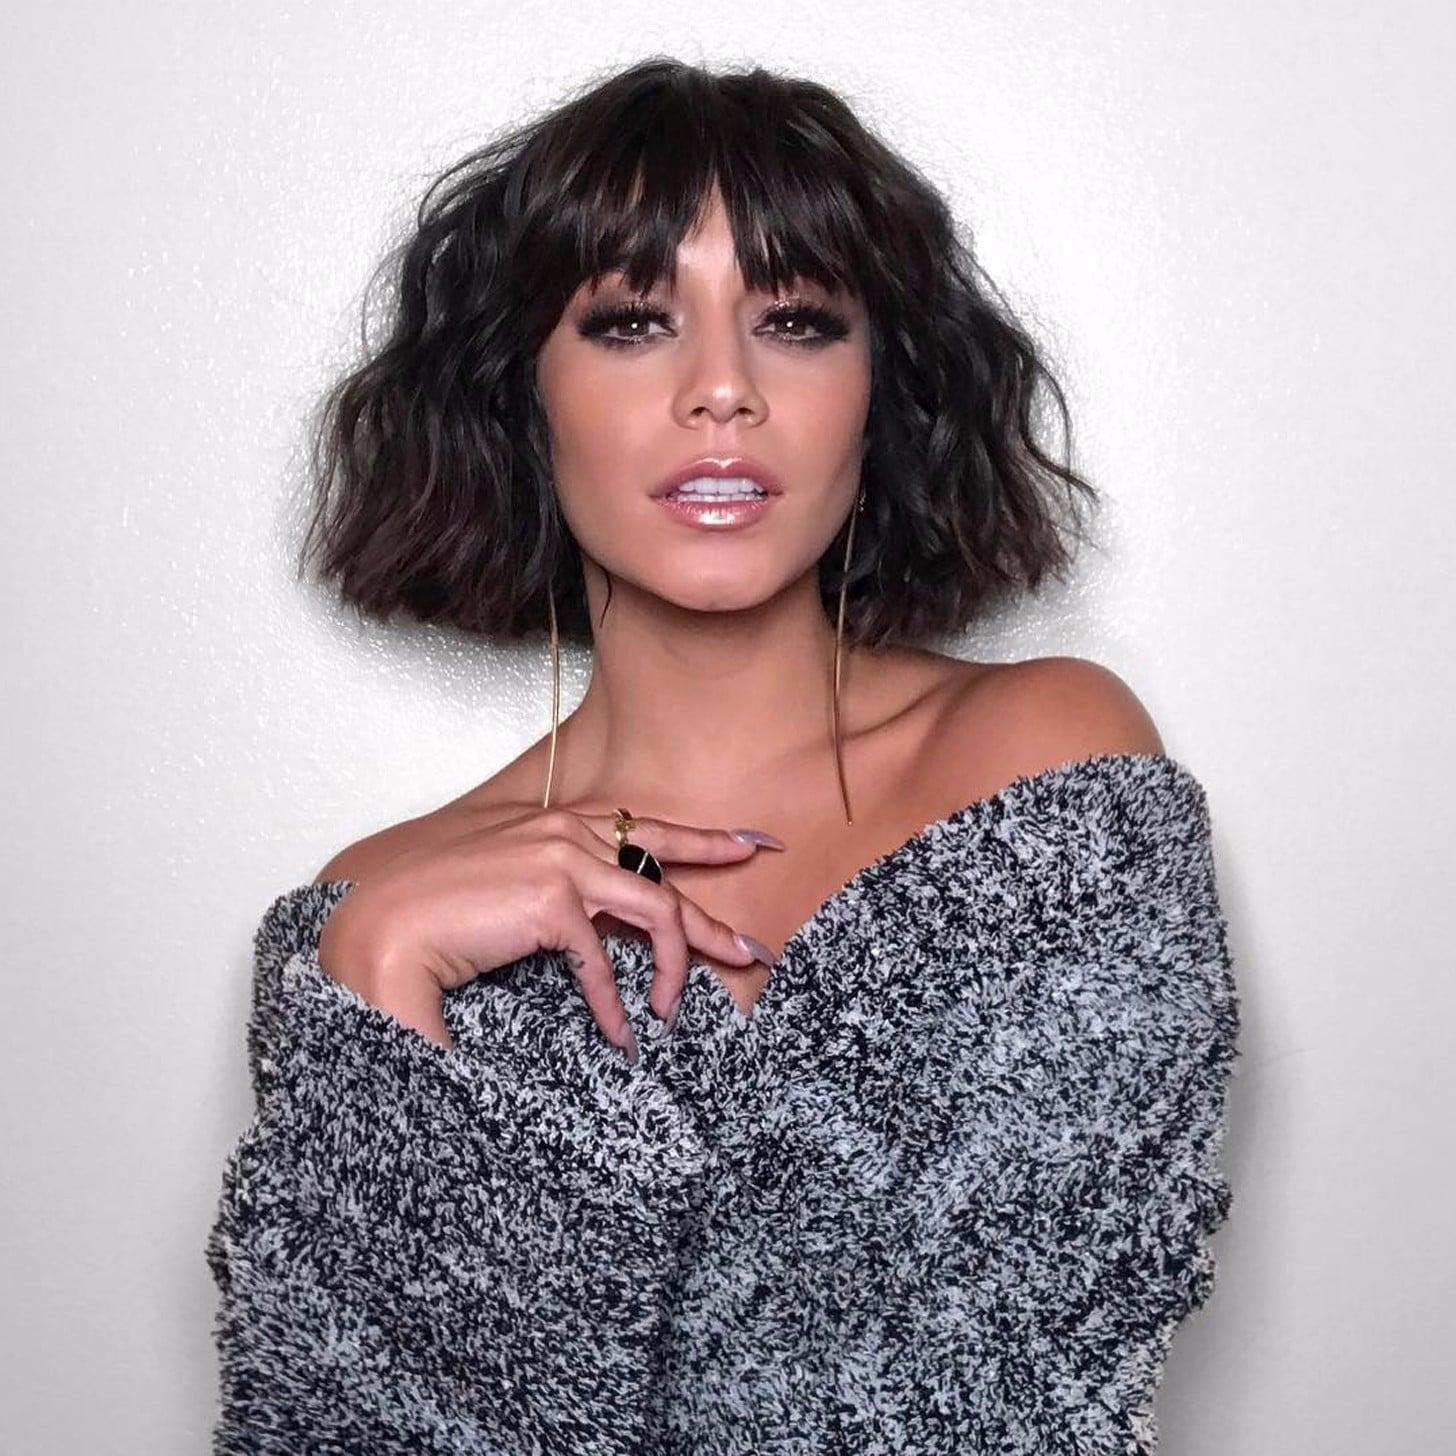 Vanessa Hudgens Haircut The Best Haircut Of 2018